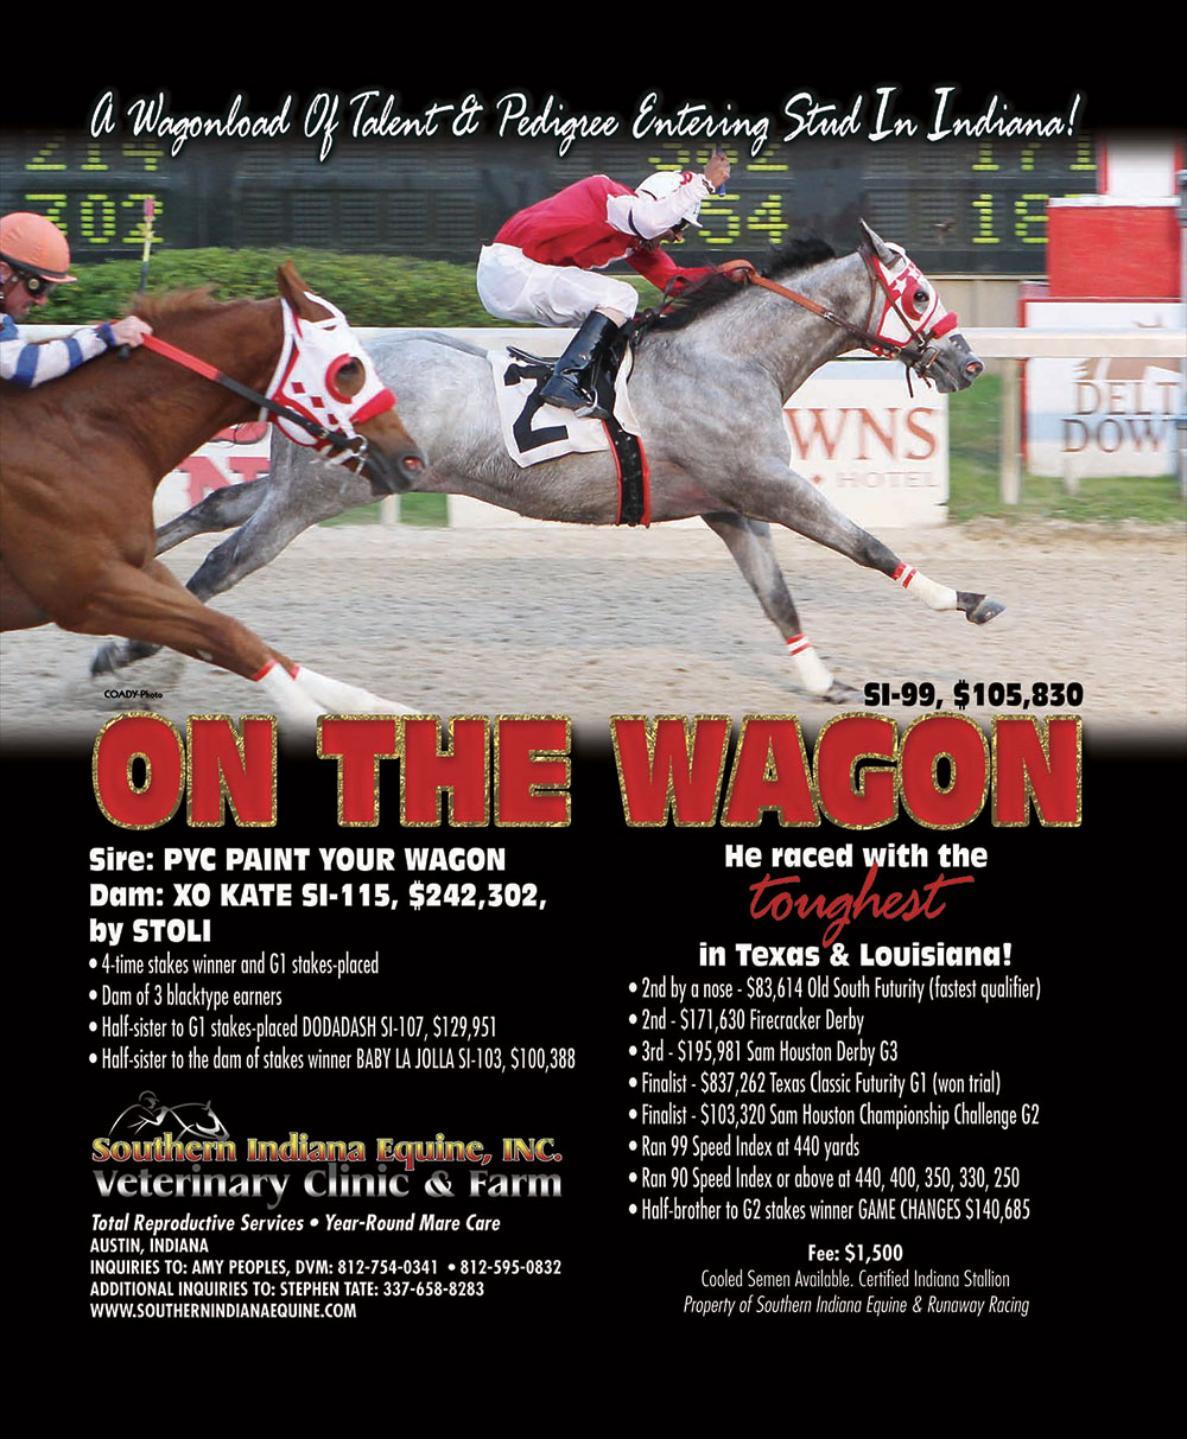 Southern Indiana Equine 2943 N Slab Rd Austin, IN 47102-8509